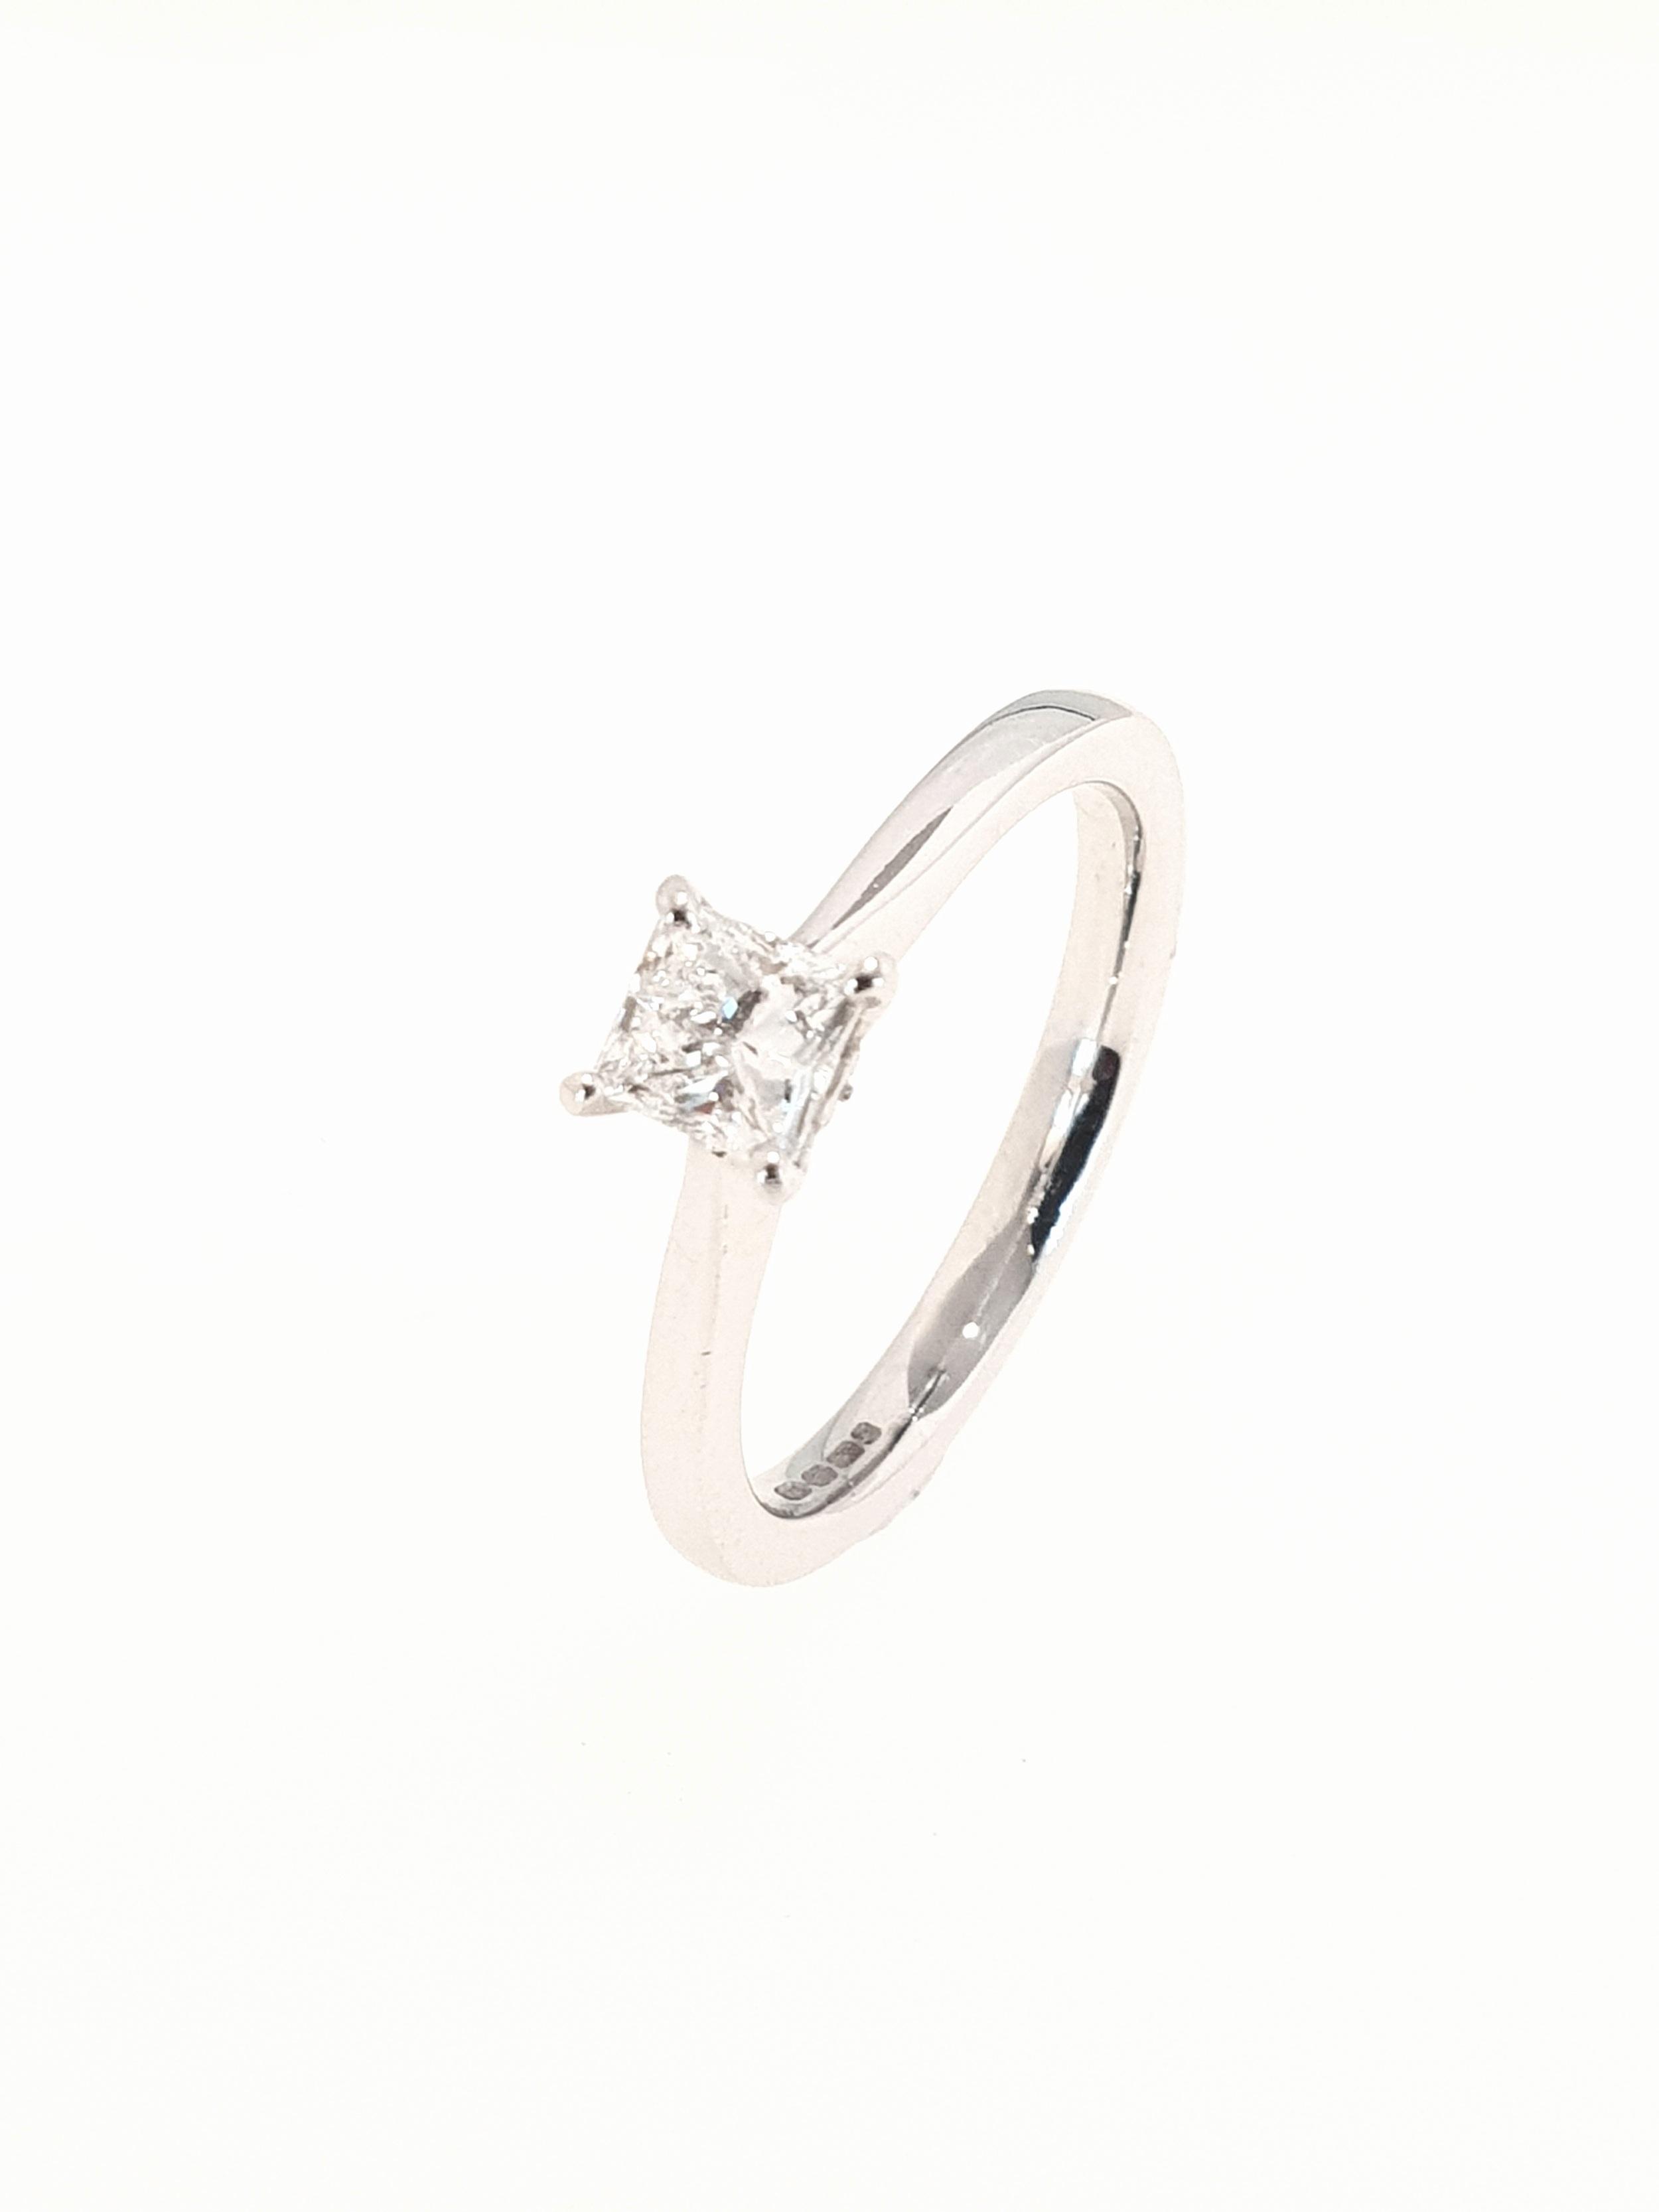 18ct White Gold Diamond Ring, Princess Cut  .50ct, G, Si1  Stock Code: N8433  £2200